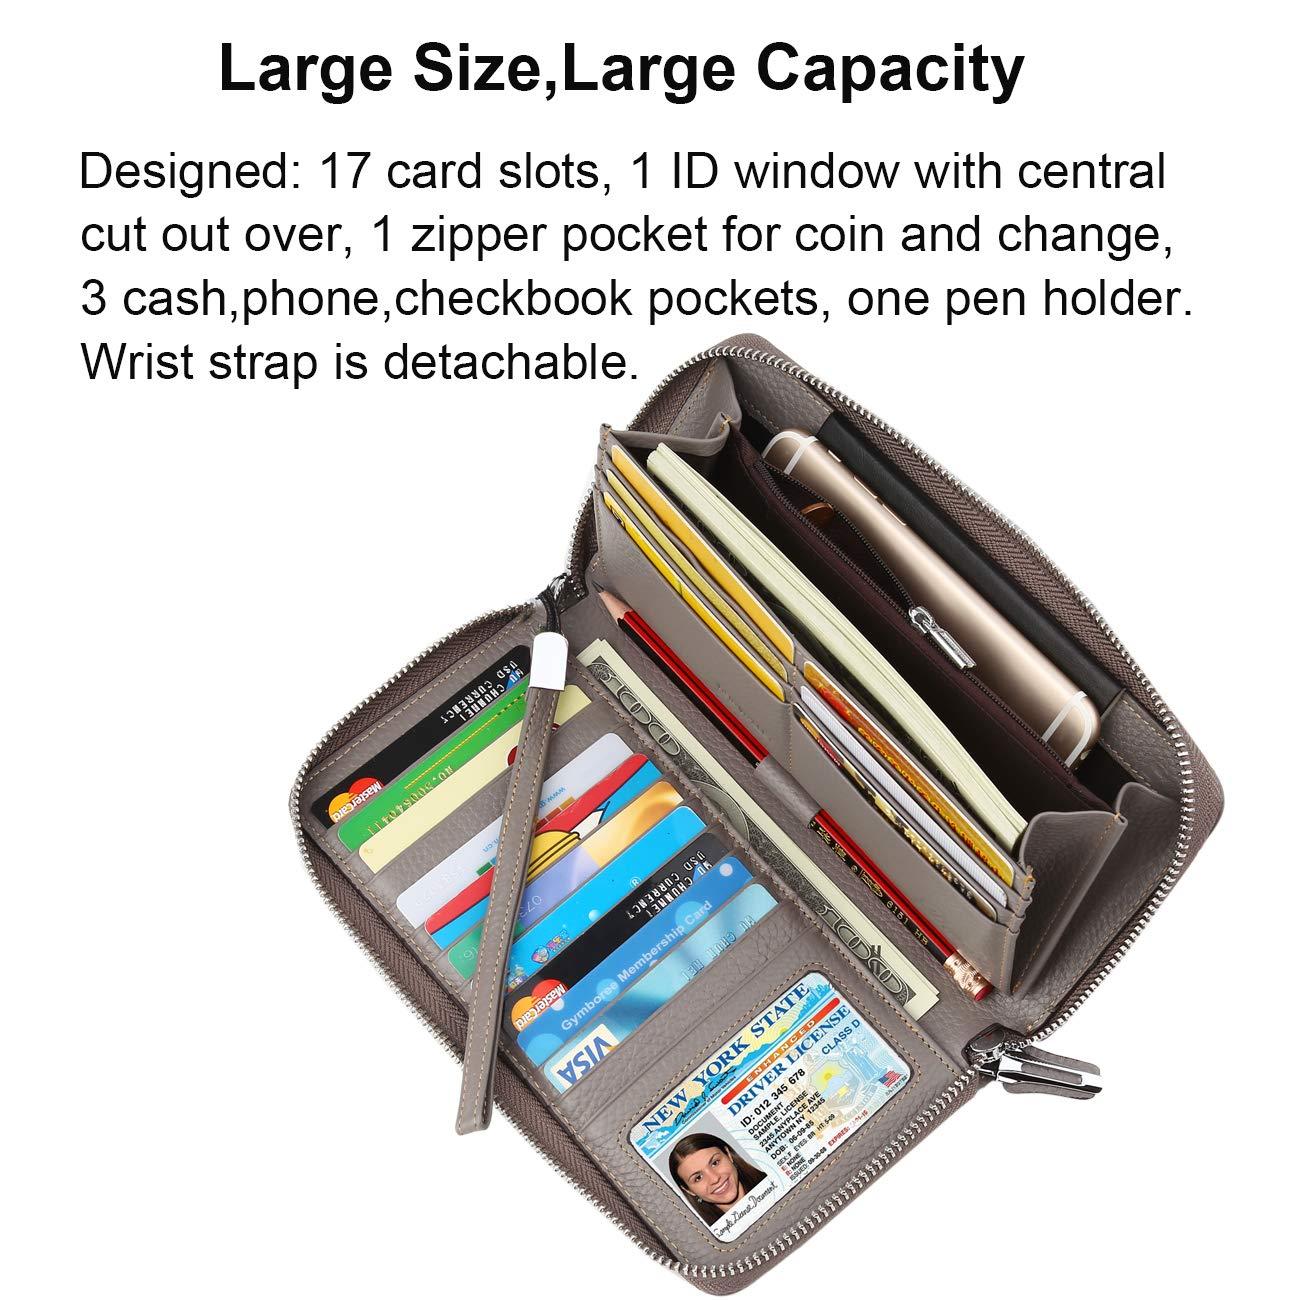 Lavemi Womens RFID Blocking Real Leather Zip Around Wallet Clutch Large Travel Purse Wristlet